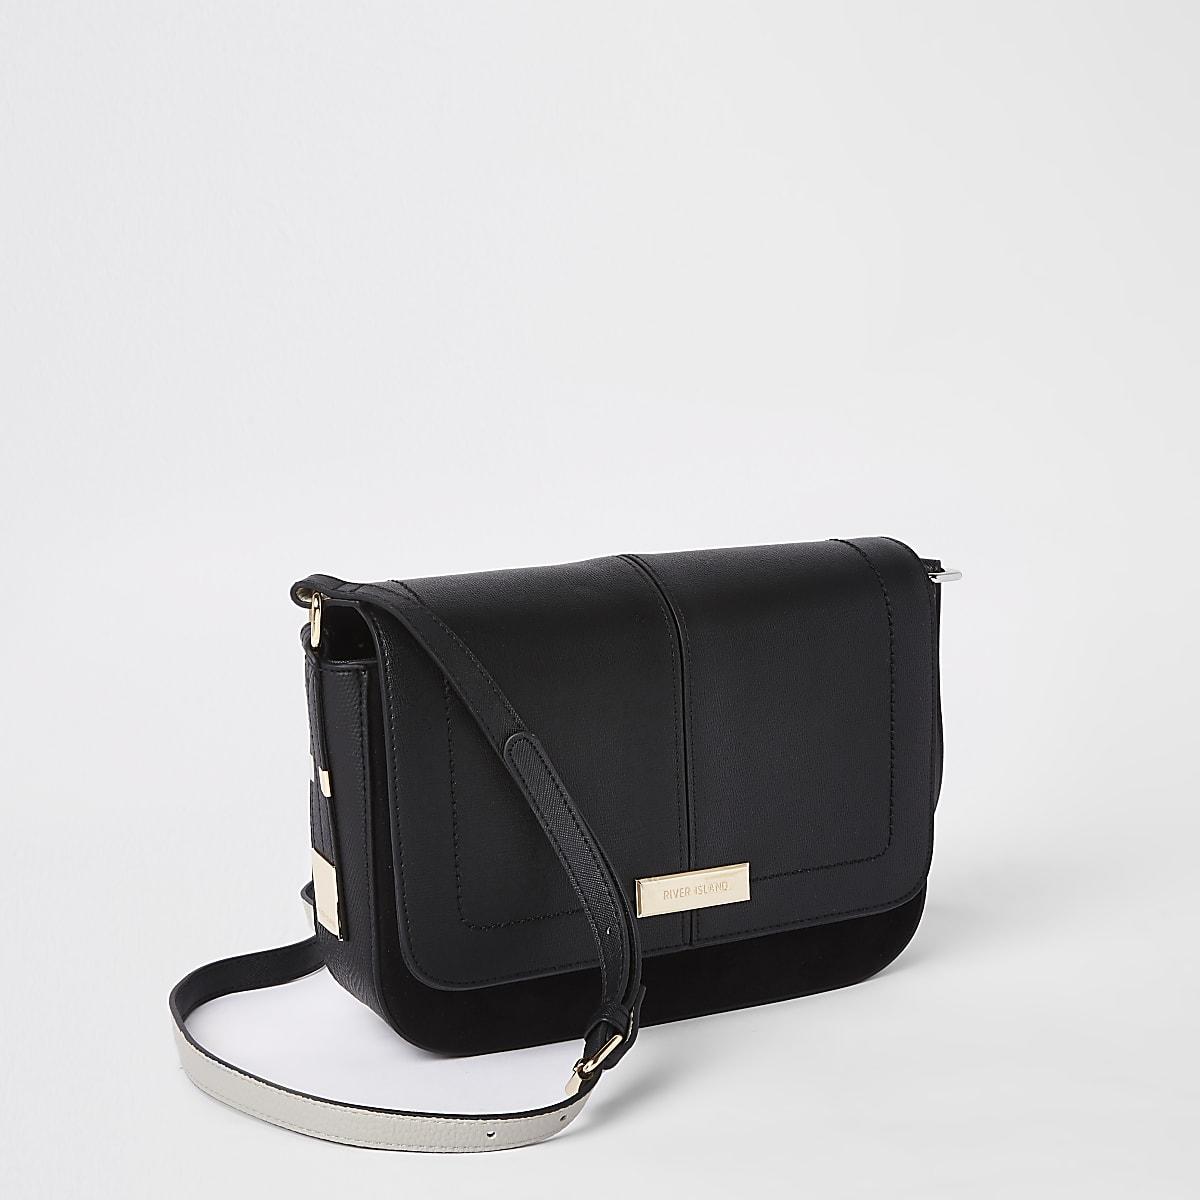 Black pouch cross body bag